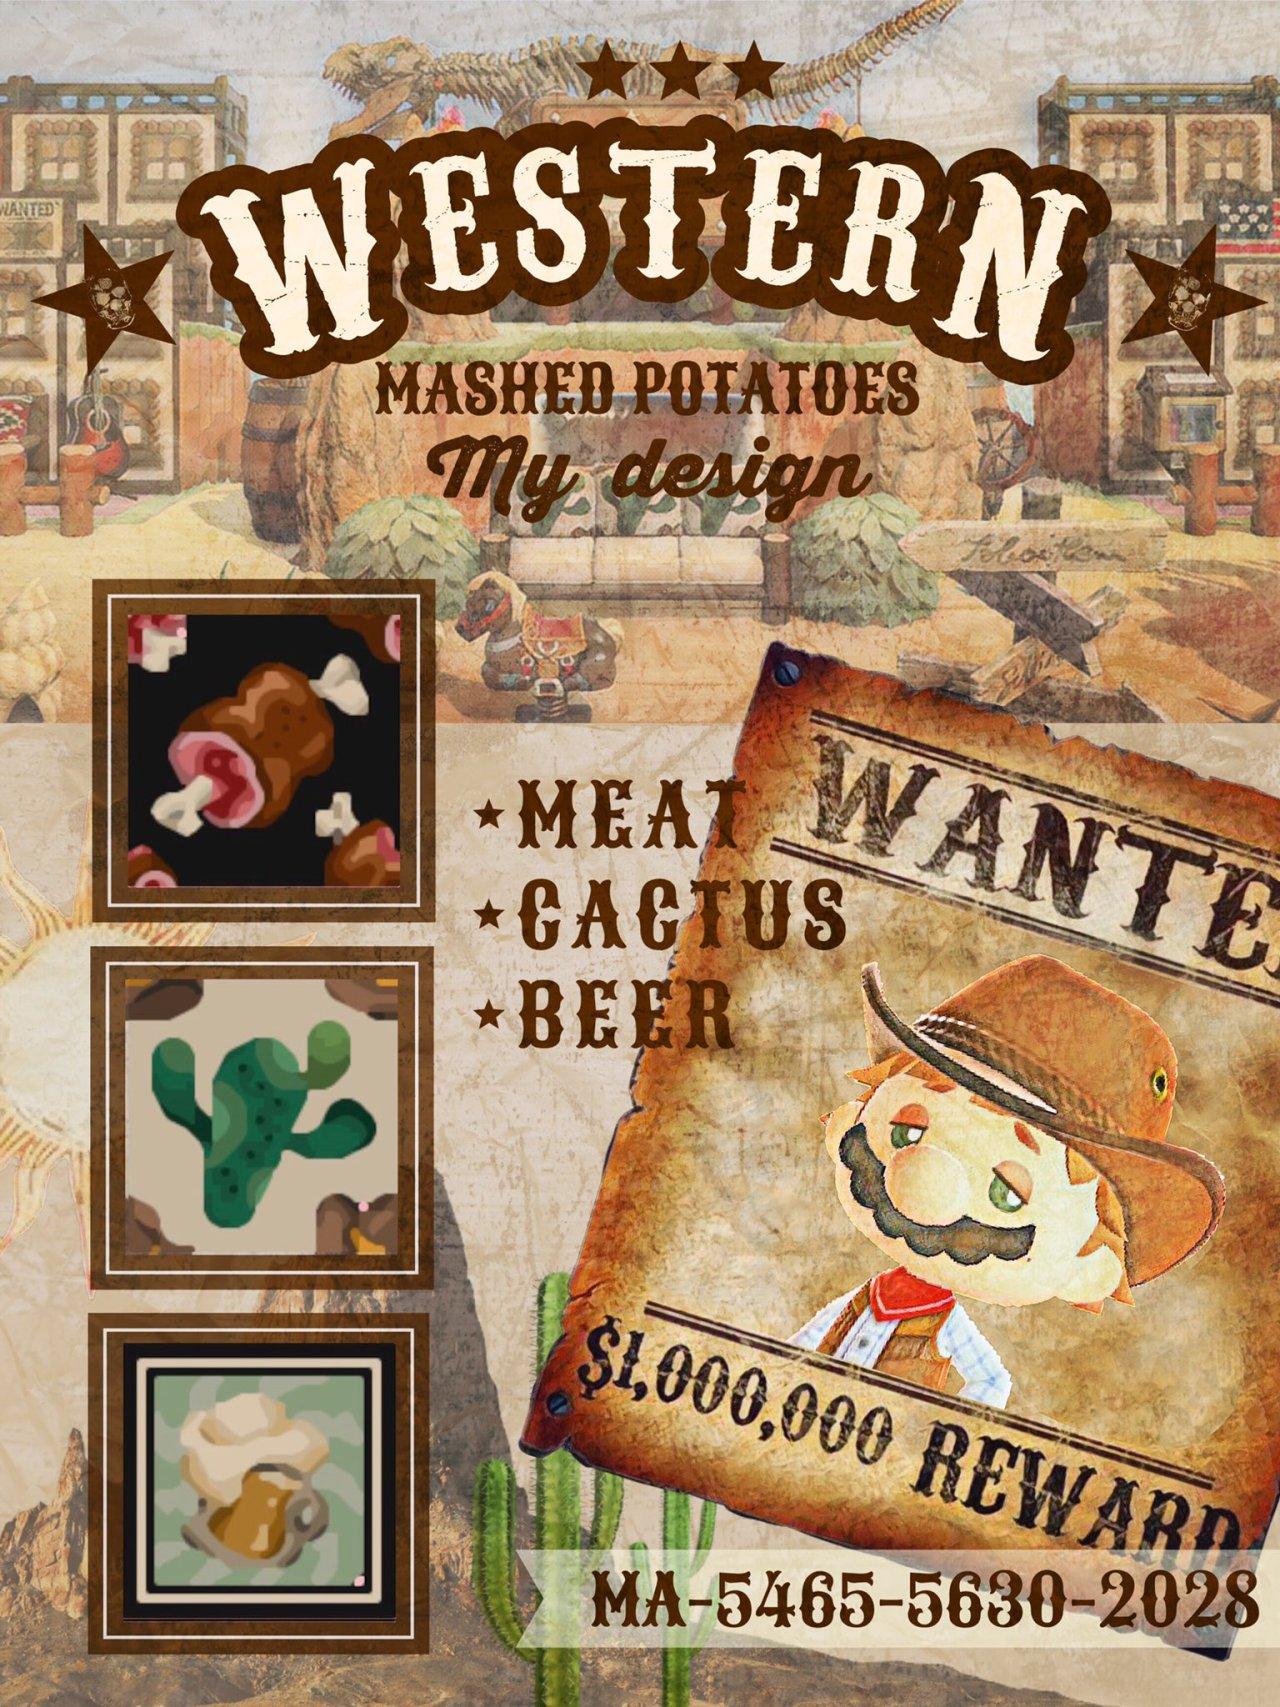 qr-closet:western fabrics - meat, cactus, & beer ✨